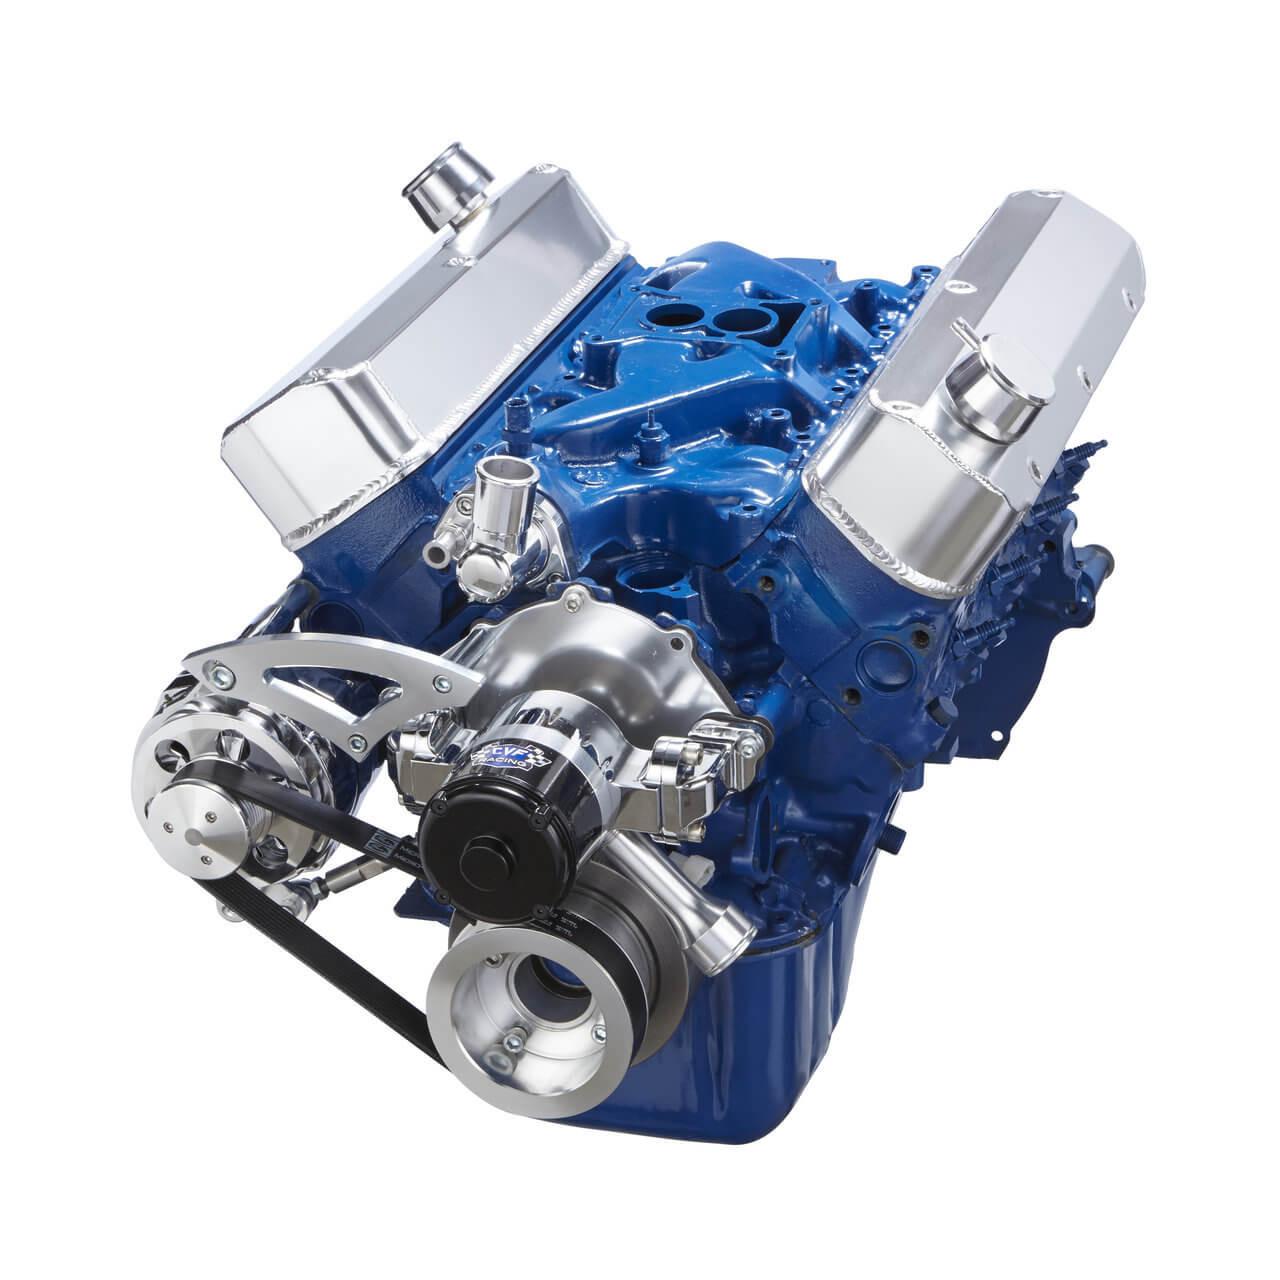 Ford Serpentine Conversion 289 302 351w Meziere High Flow Ewp